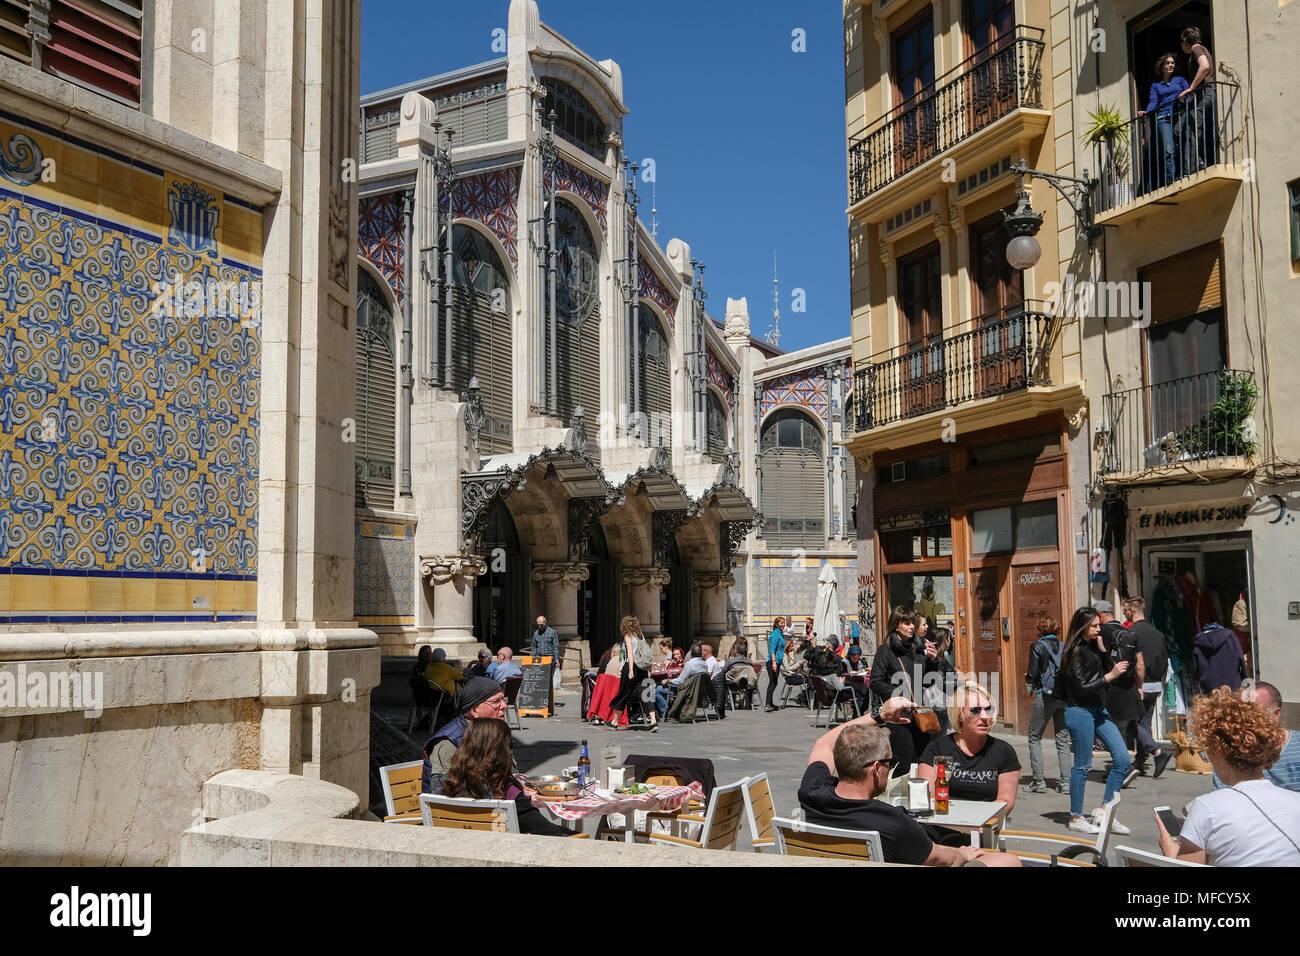 People sitting outside cafes near popular Mercado Central food market, North Ciutat Vella, Valencia, Spain. - Stock Image